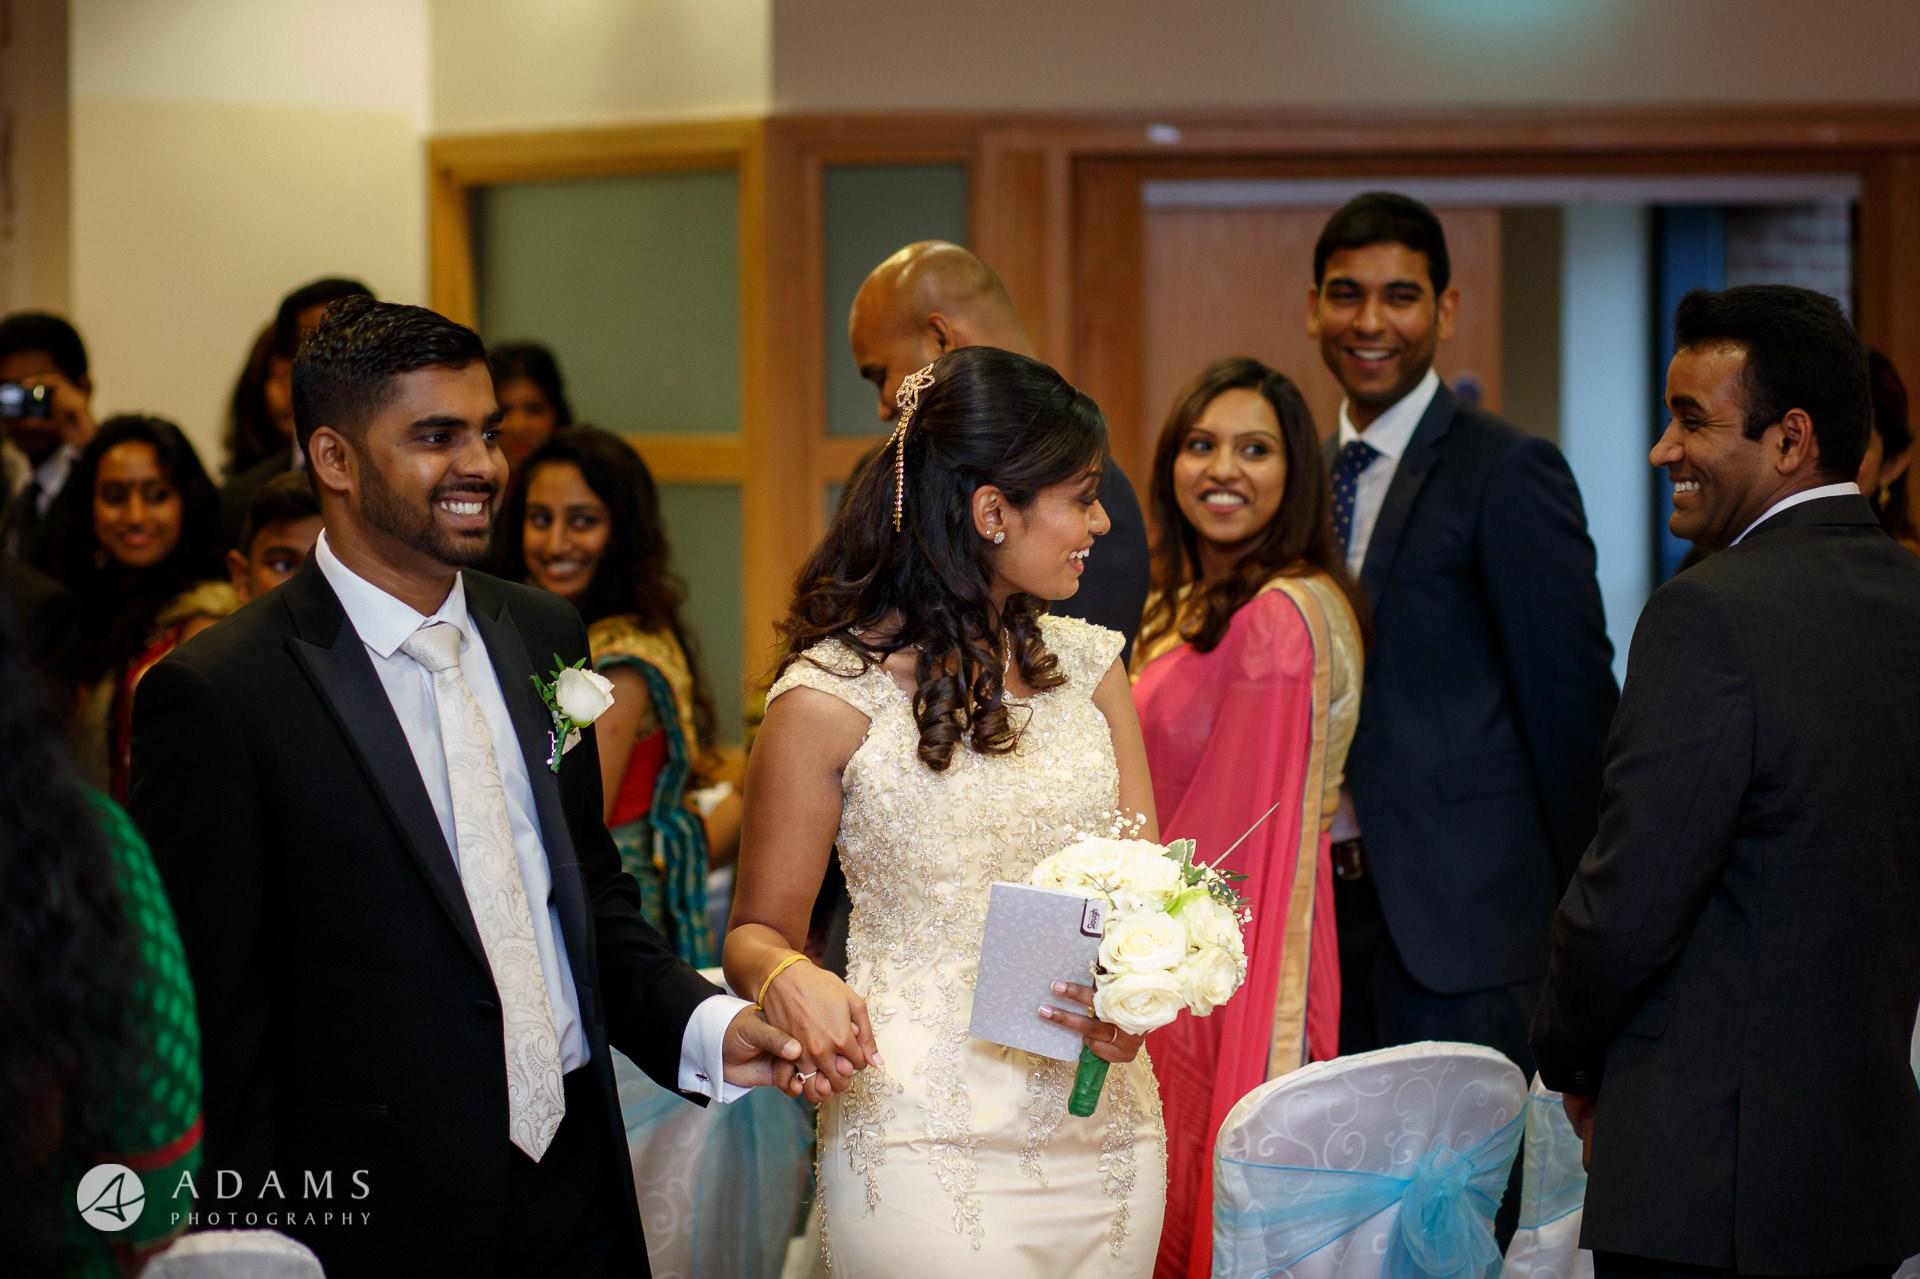 Baylis House Wedding Photographer | Sara + Anojan 17